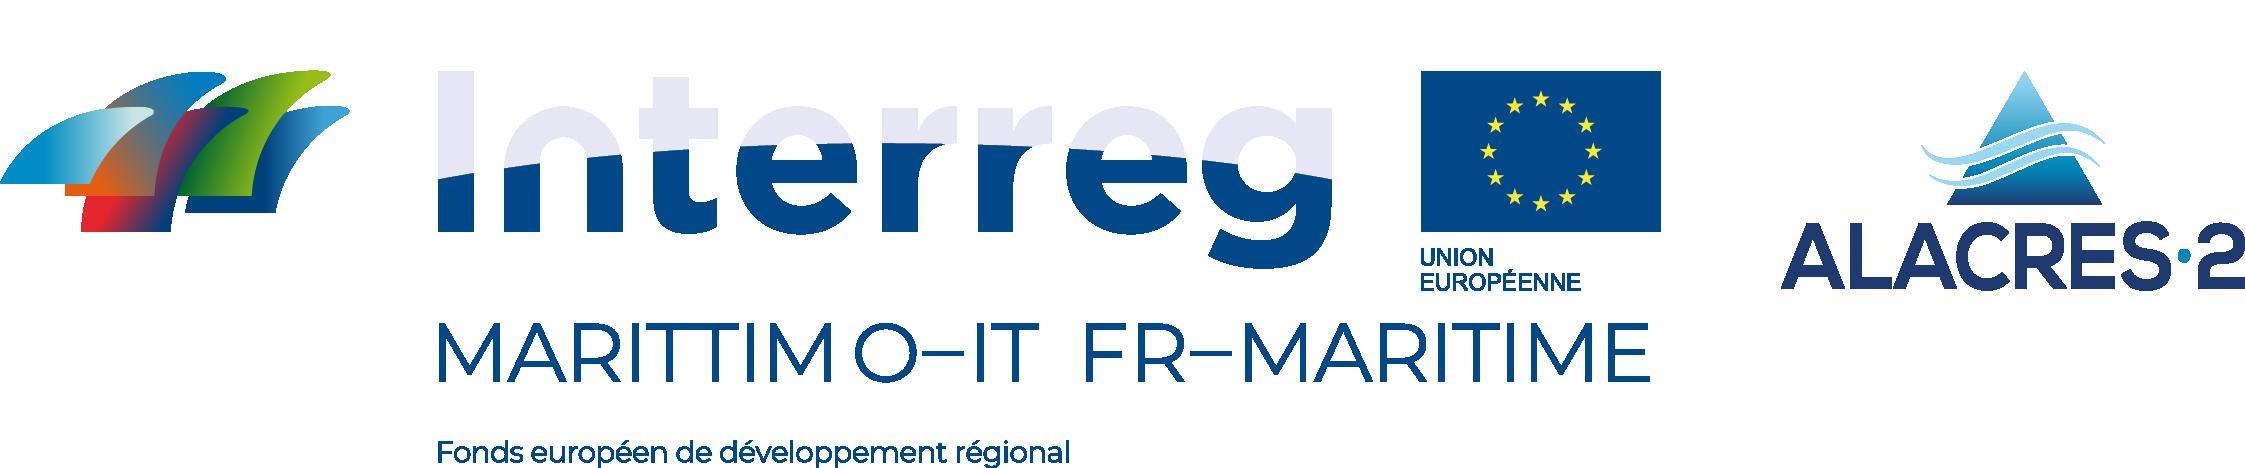 ALACRES2 Interreg Marine Project